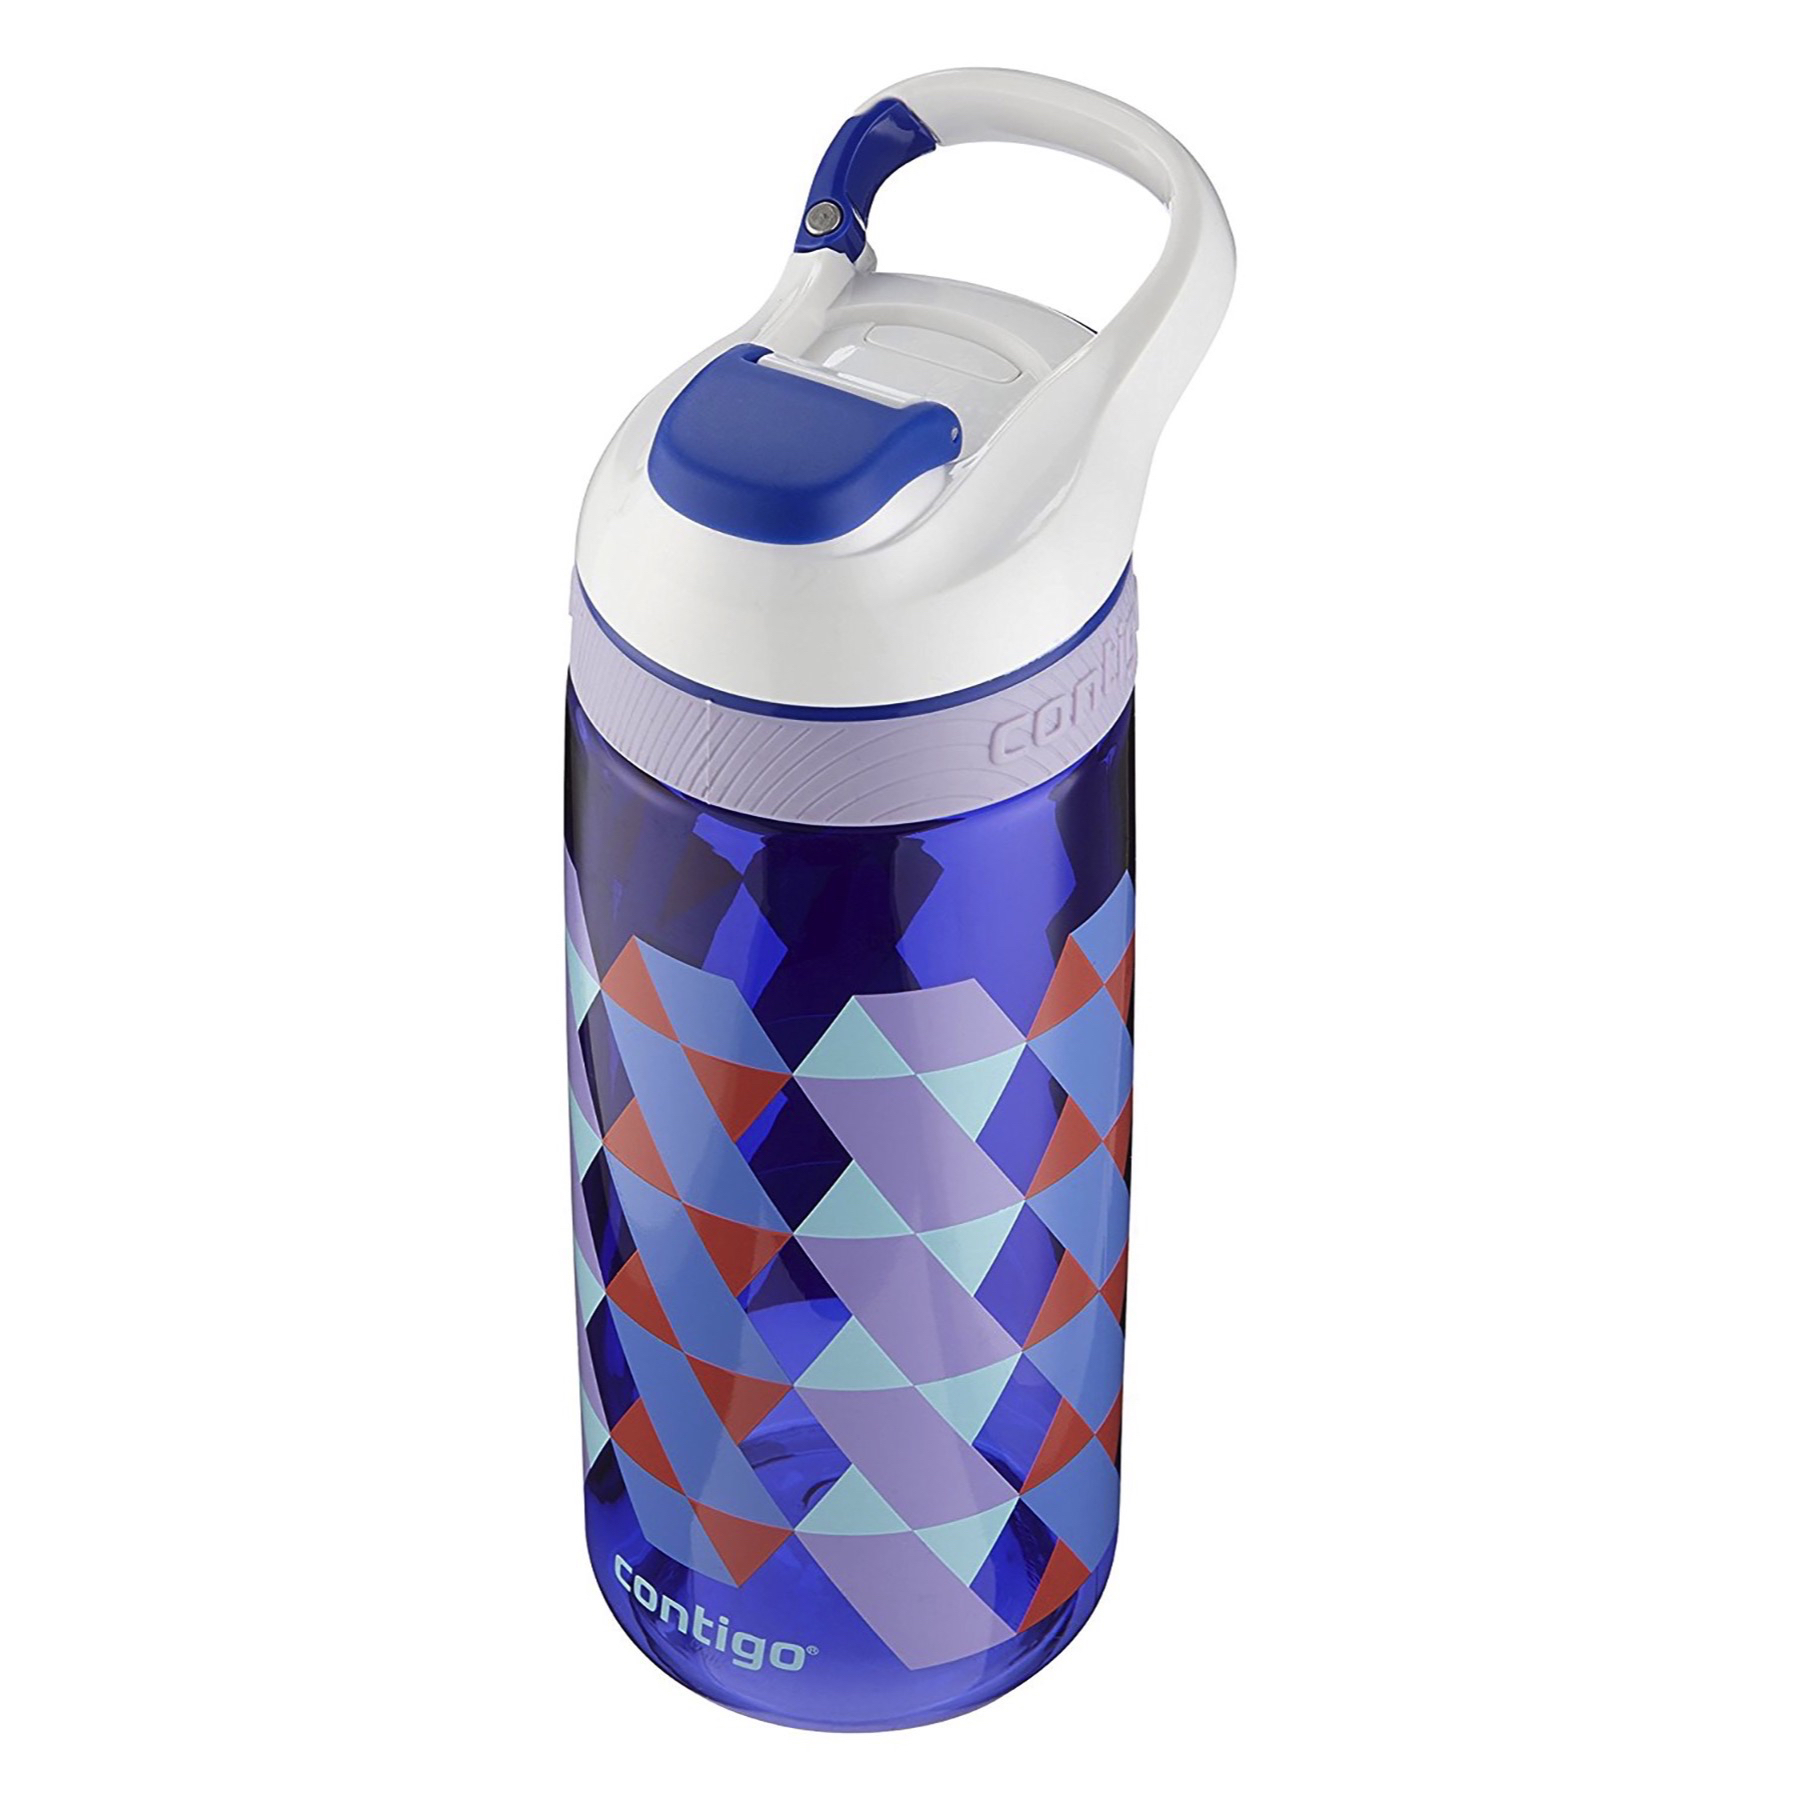 Contigo AUTOSEAL Courtney Kids Water Bottle 20oz Cerulean Braid Blue BPA-Free